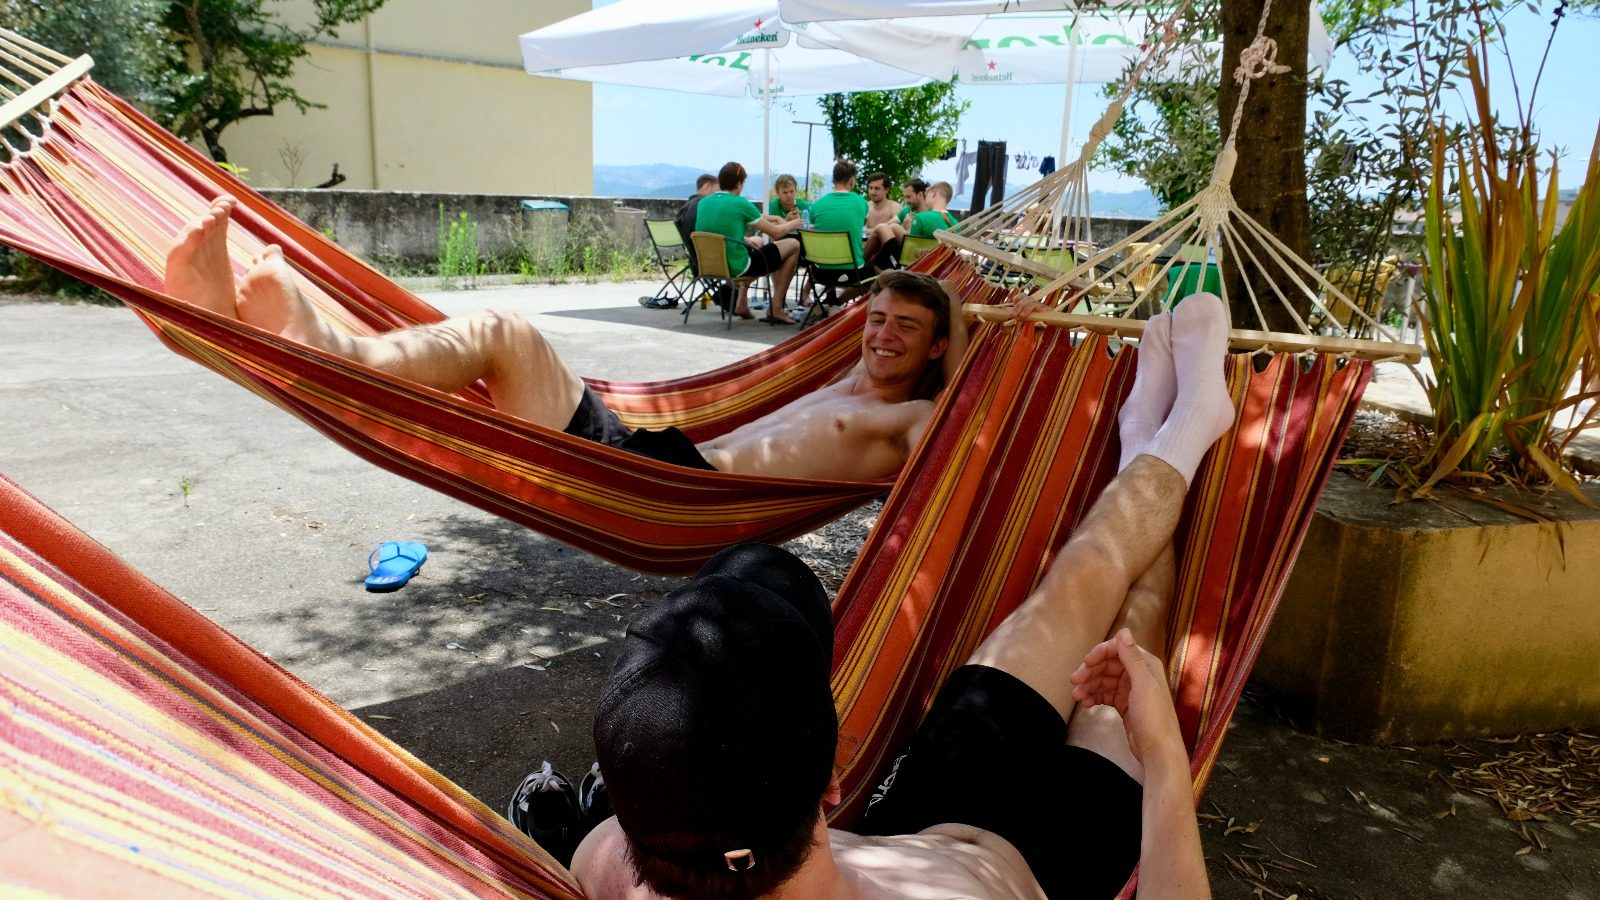 Antibarbari-in-Coimbra-EU-games-hangmat